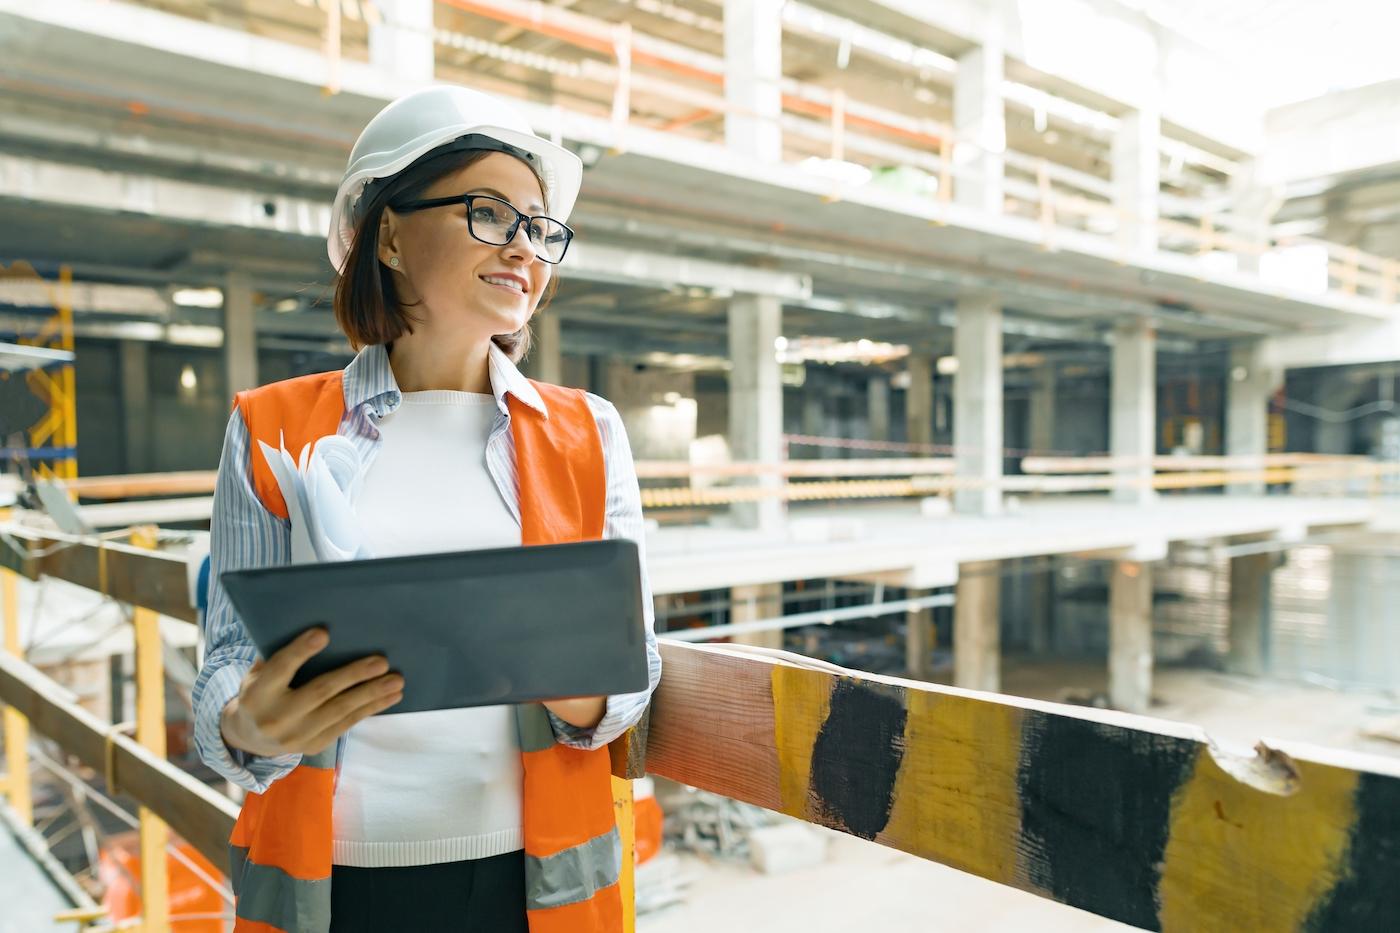 Portrait of mature architect woman at a construction site. Building, development, teamwork and people concept.